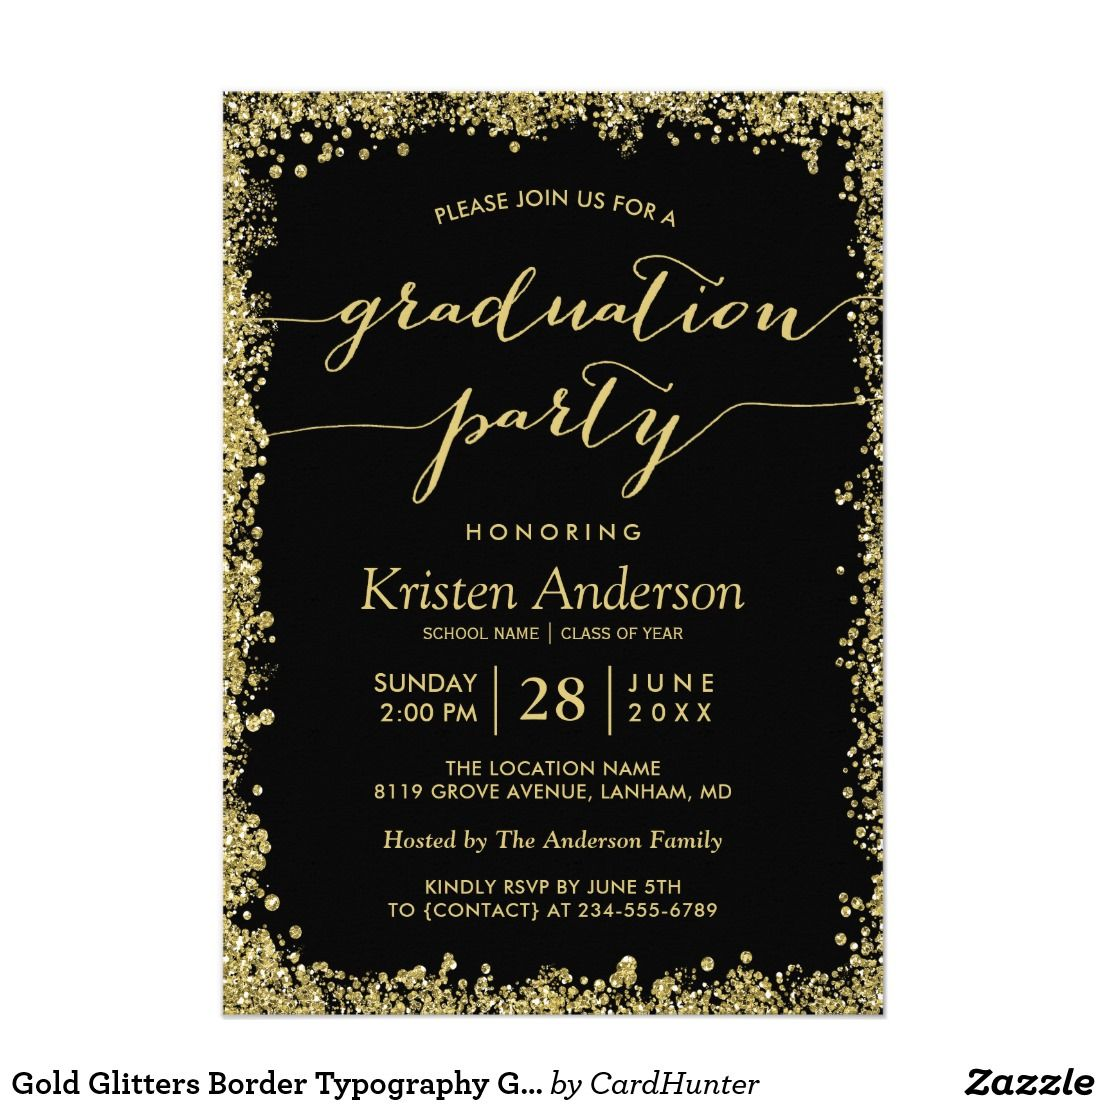 Graduation Party Invitation Card Gold Glitters Border Typography Graduation Party Invitations College Graduation Party Invitations Graduation Party